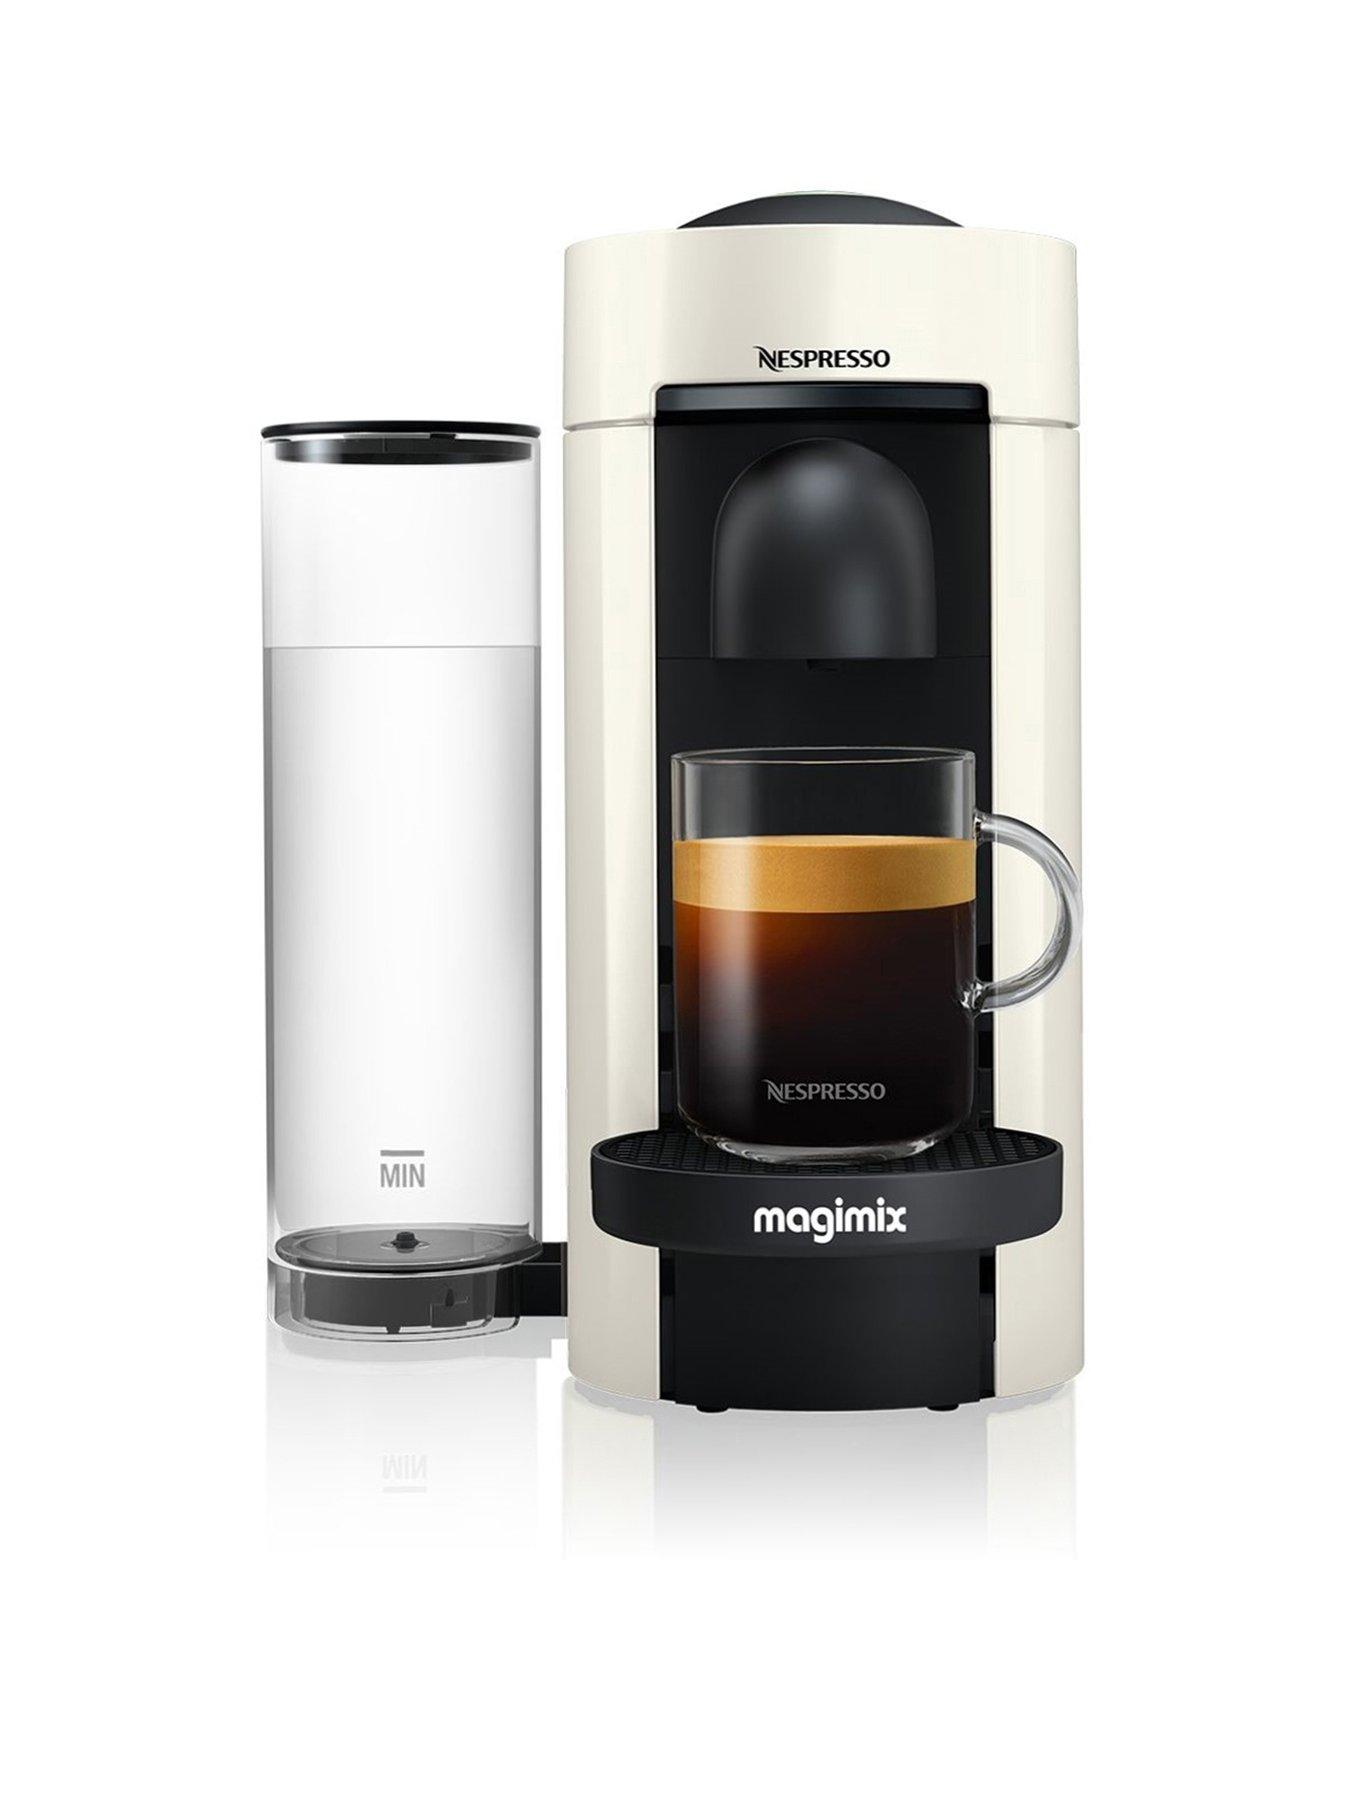 Set of 2 pcs double wall Nestle Nespresso glass coffee cups mugs 150ML Espresso Citiz Lungo Capsule thermal glass@MJH | Wish